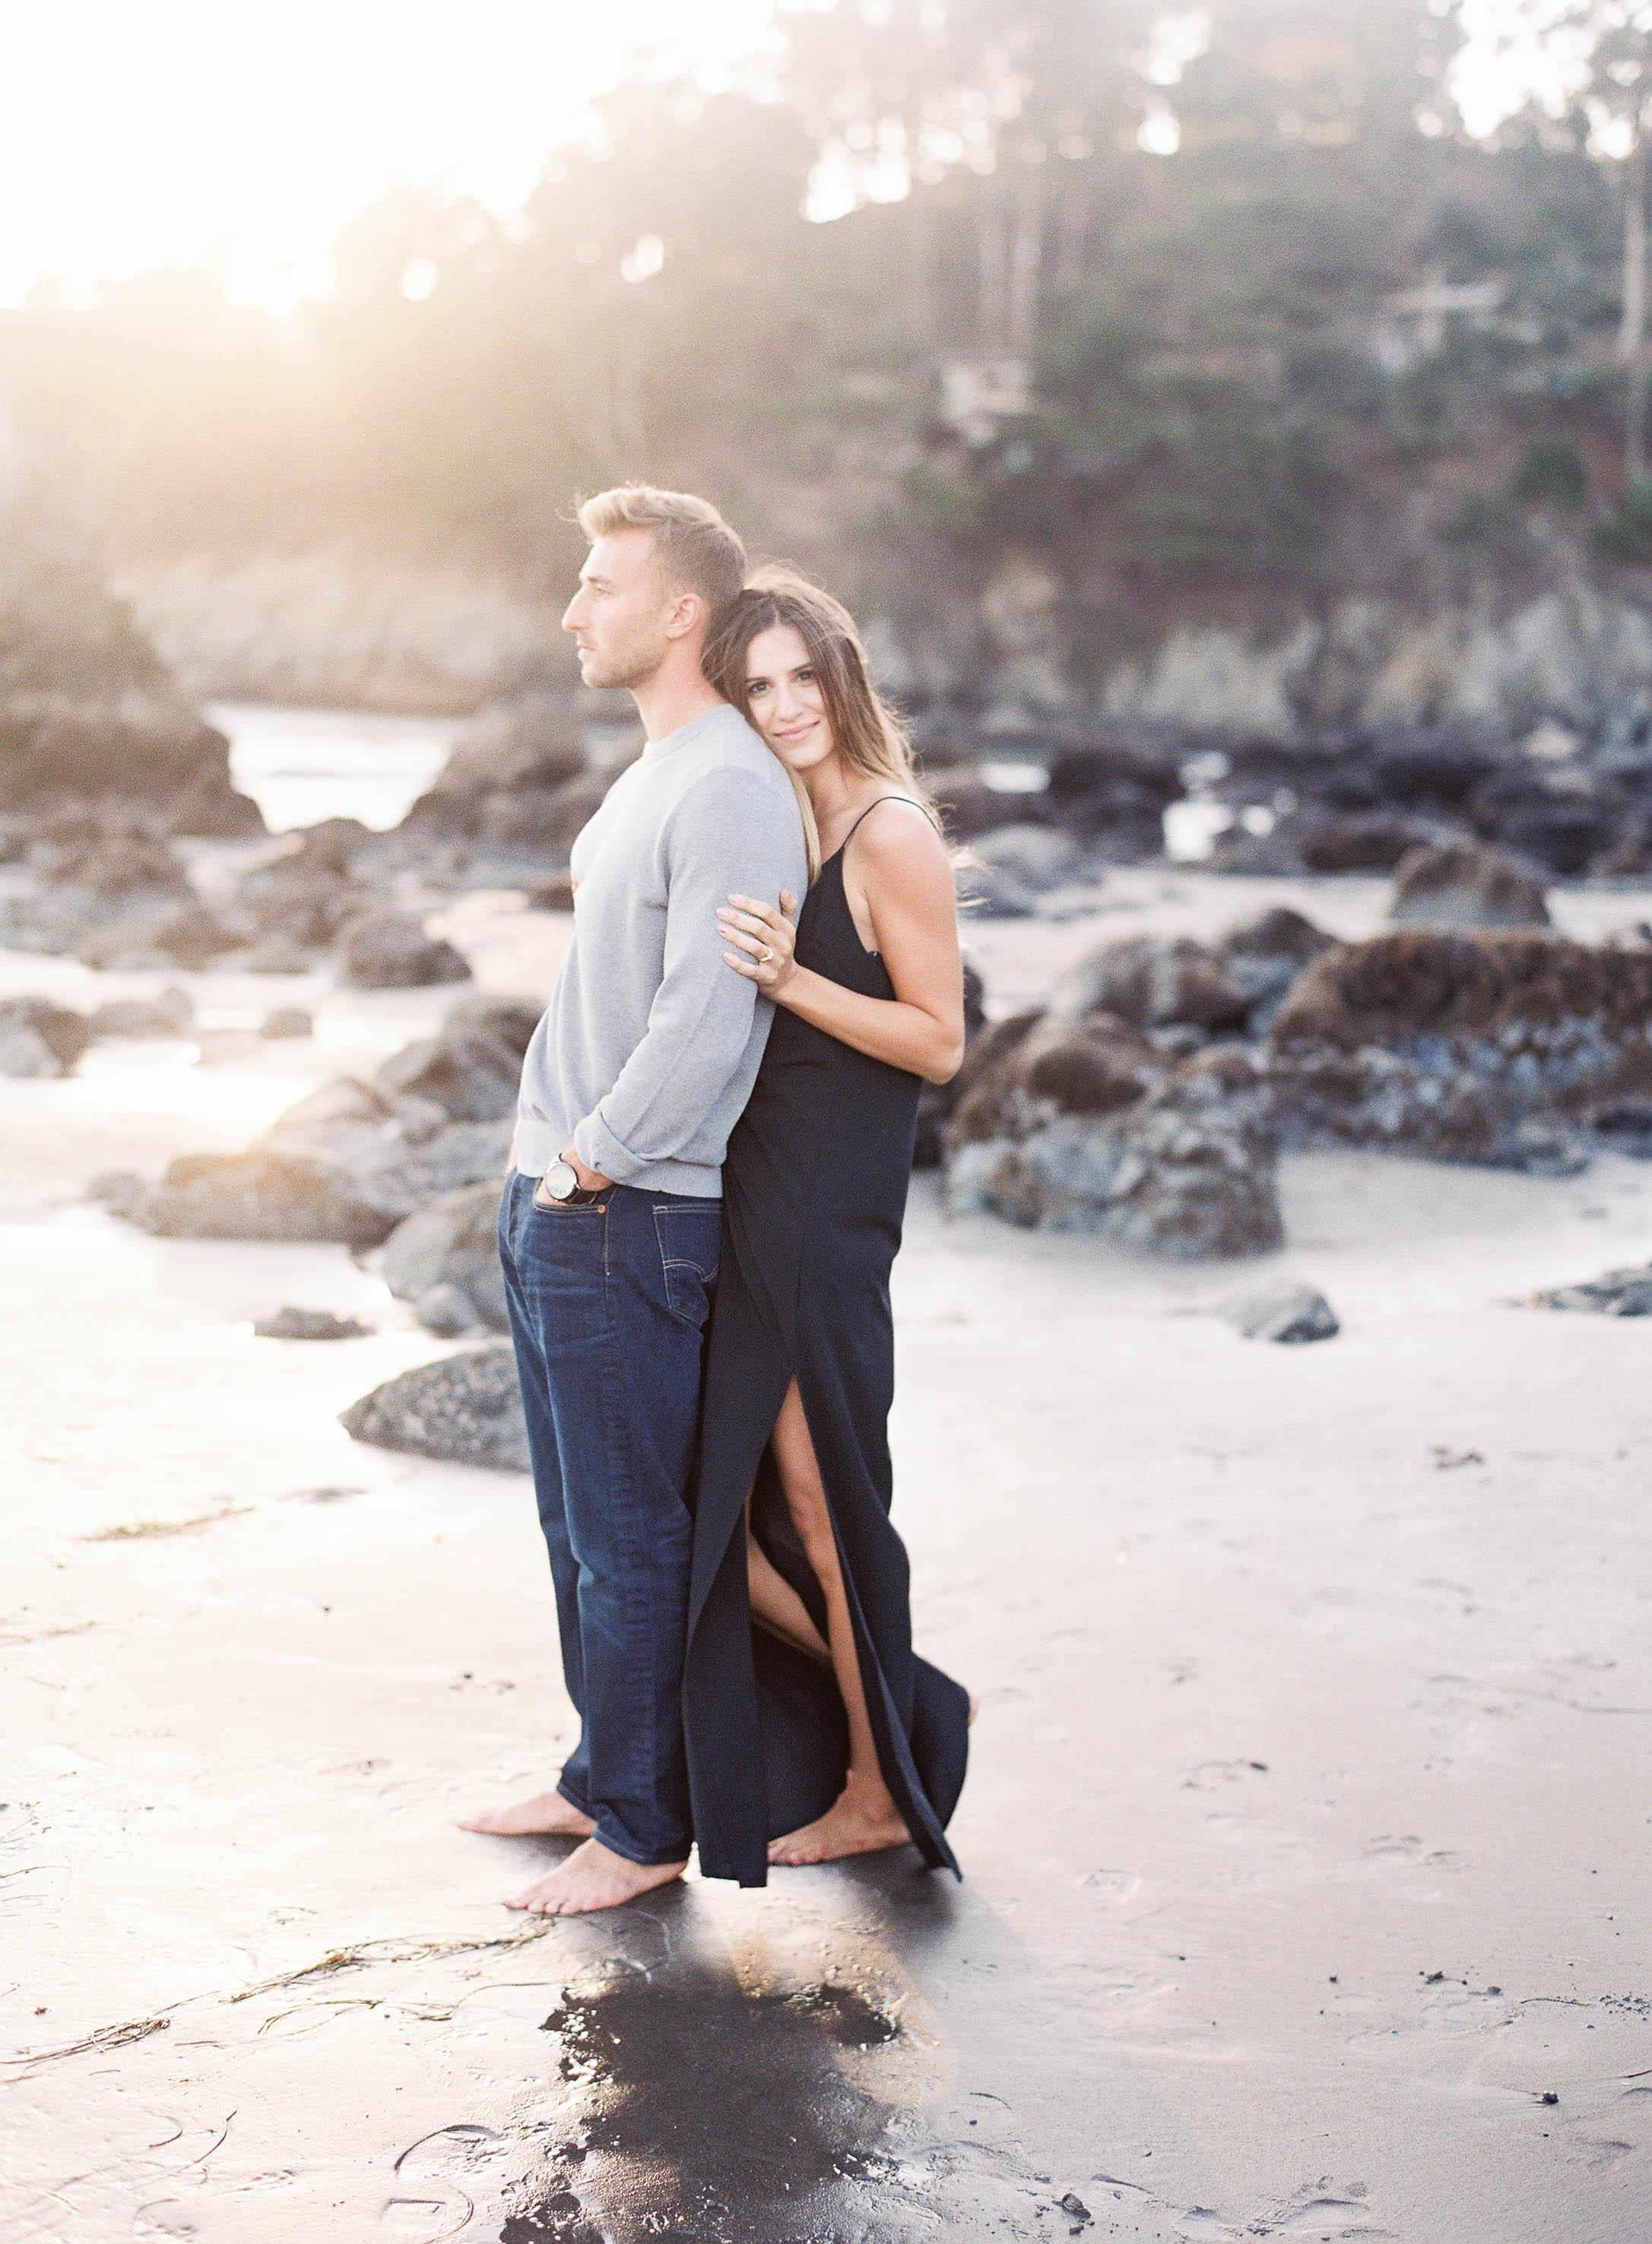 Meghan Mehan Photography - Fine Art Film Wedding Photography - San Francisco | Napa | Sonoma | Big Sur | Chicago | Minneapolis | Milwaukee | Lake Geneva | Door County | Wisconsin 016.jpg